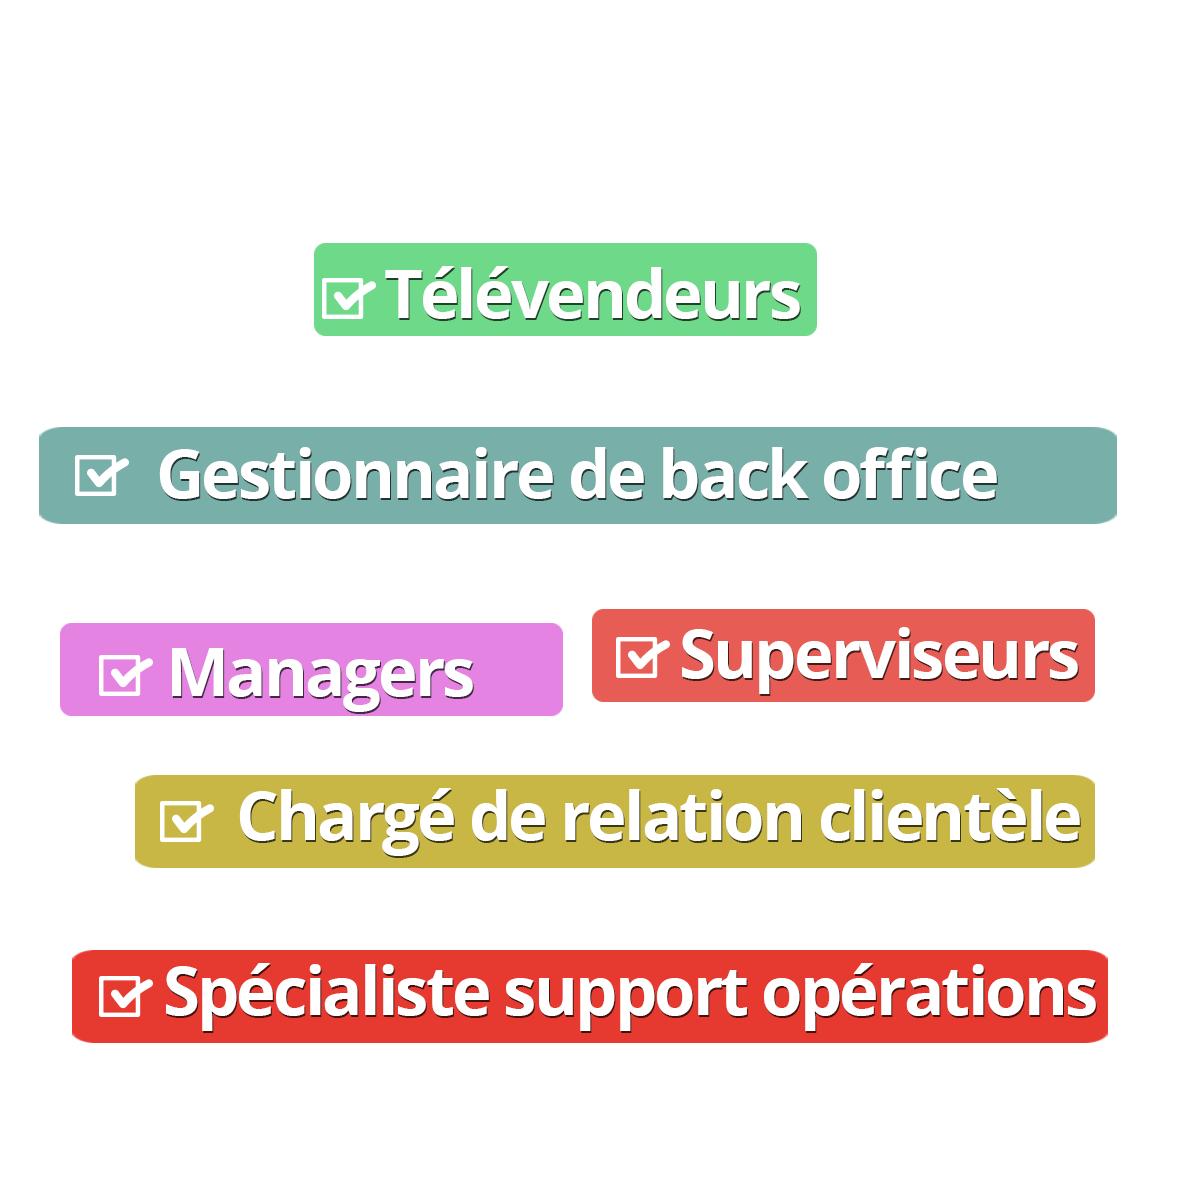 Formation aux métiers de la relation clientèle - Togo bénin mali Burkina Faso Cameroun Sénégal Niger